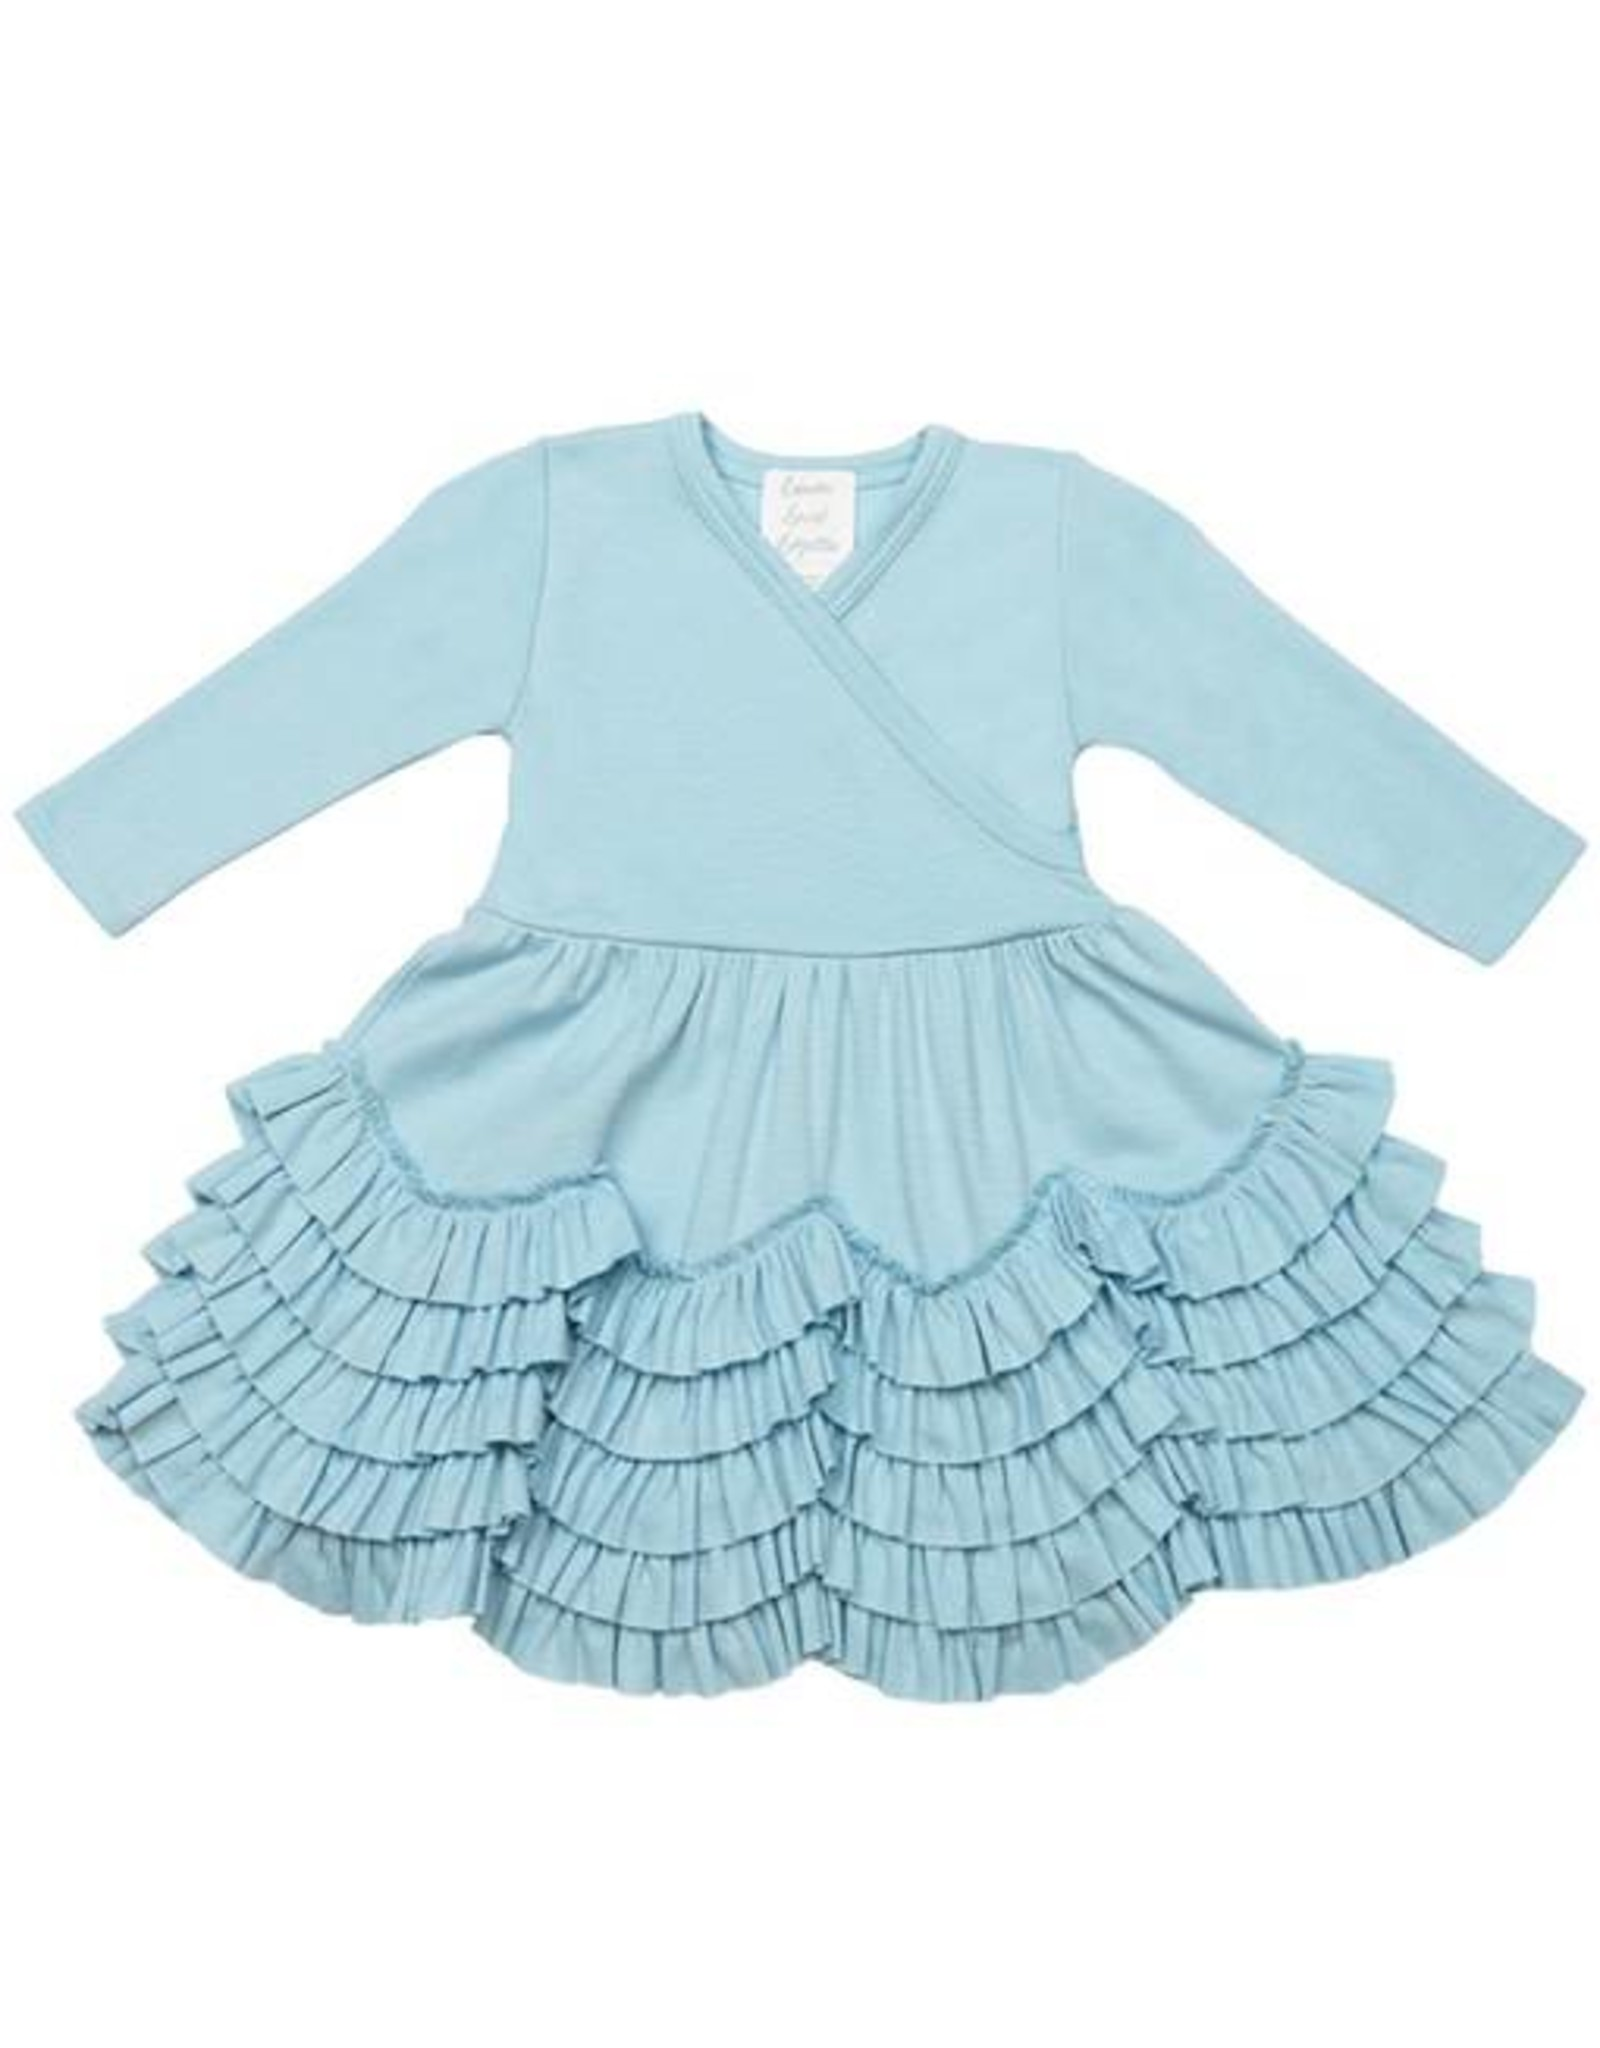 Jada Dress in Cinderella